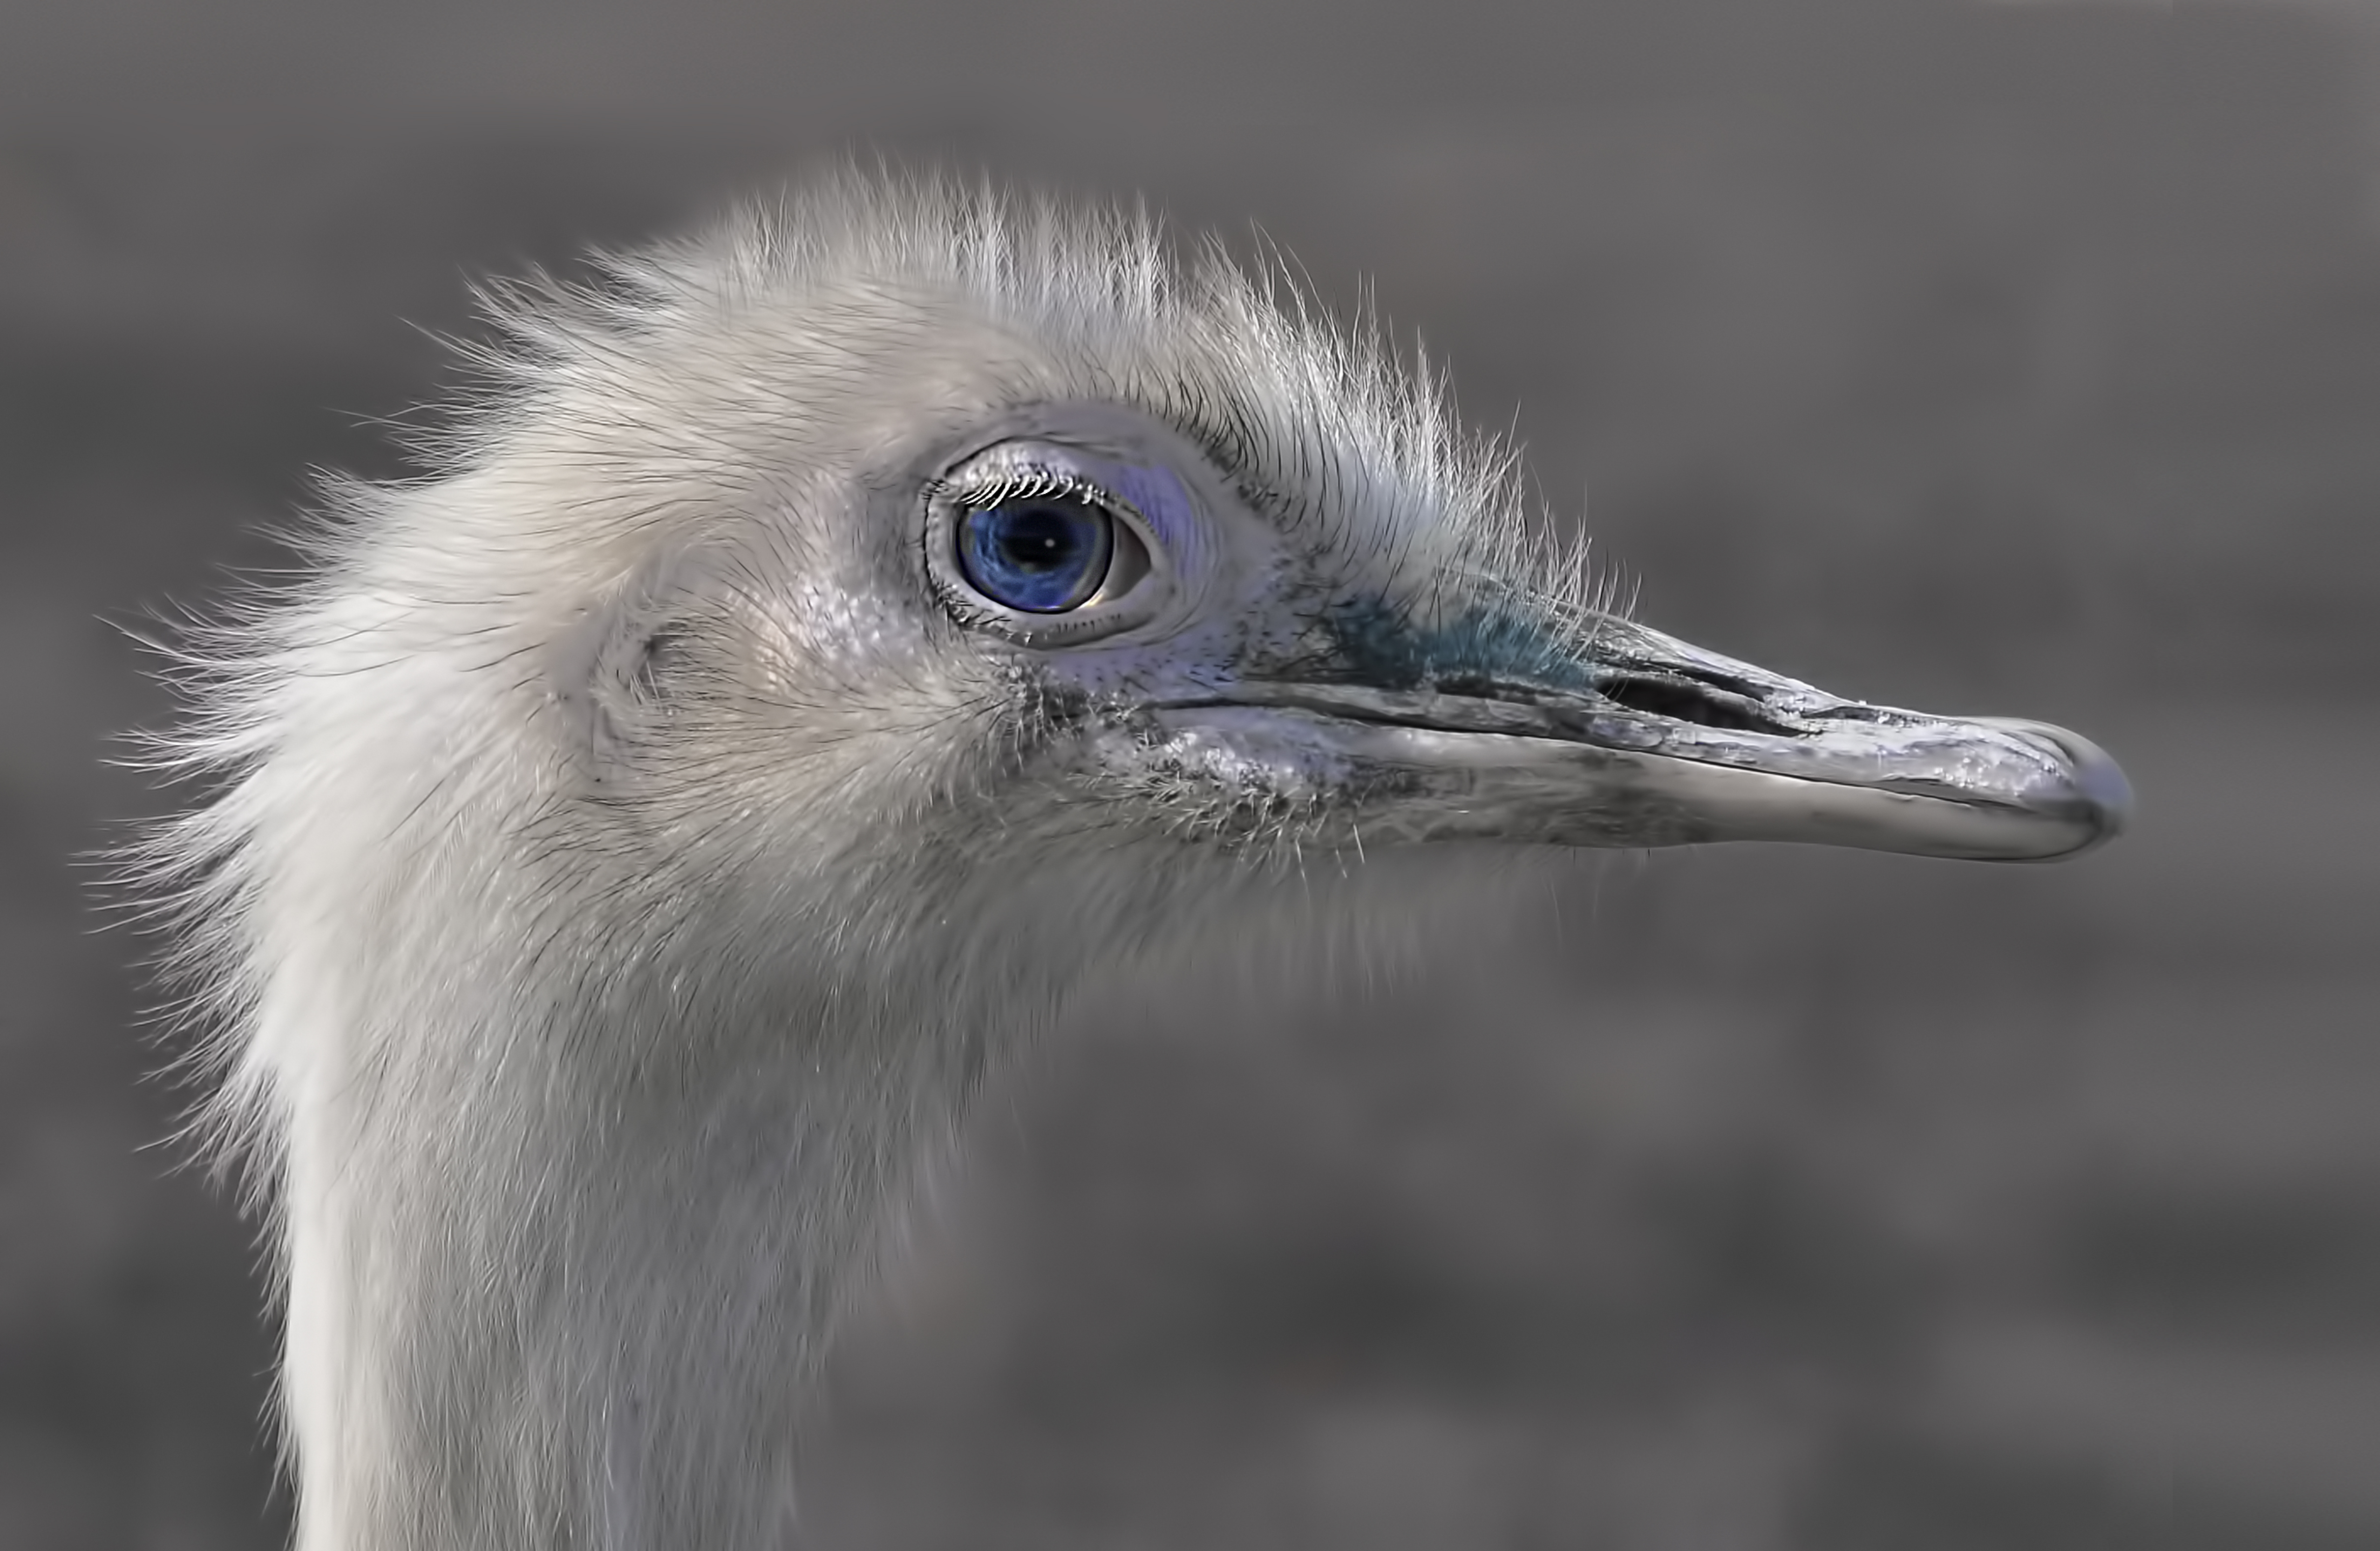 15 Points-One blue eye-Jenny Fryer LRPS